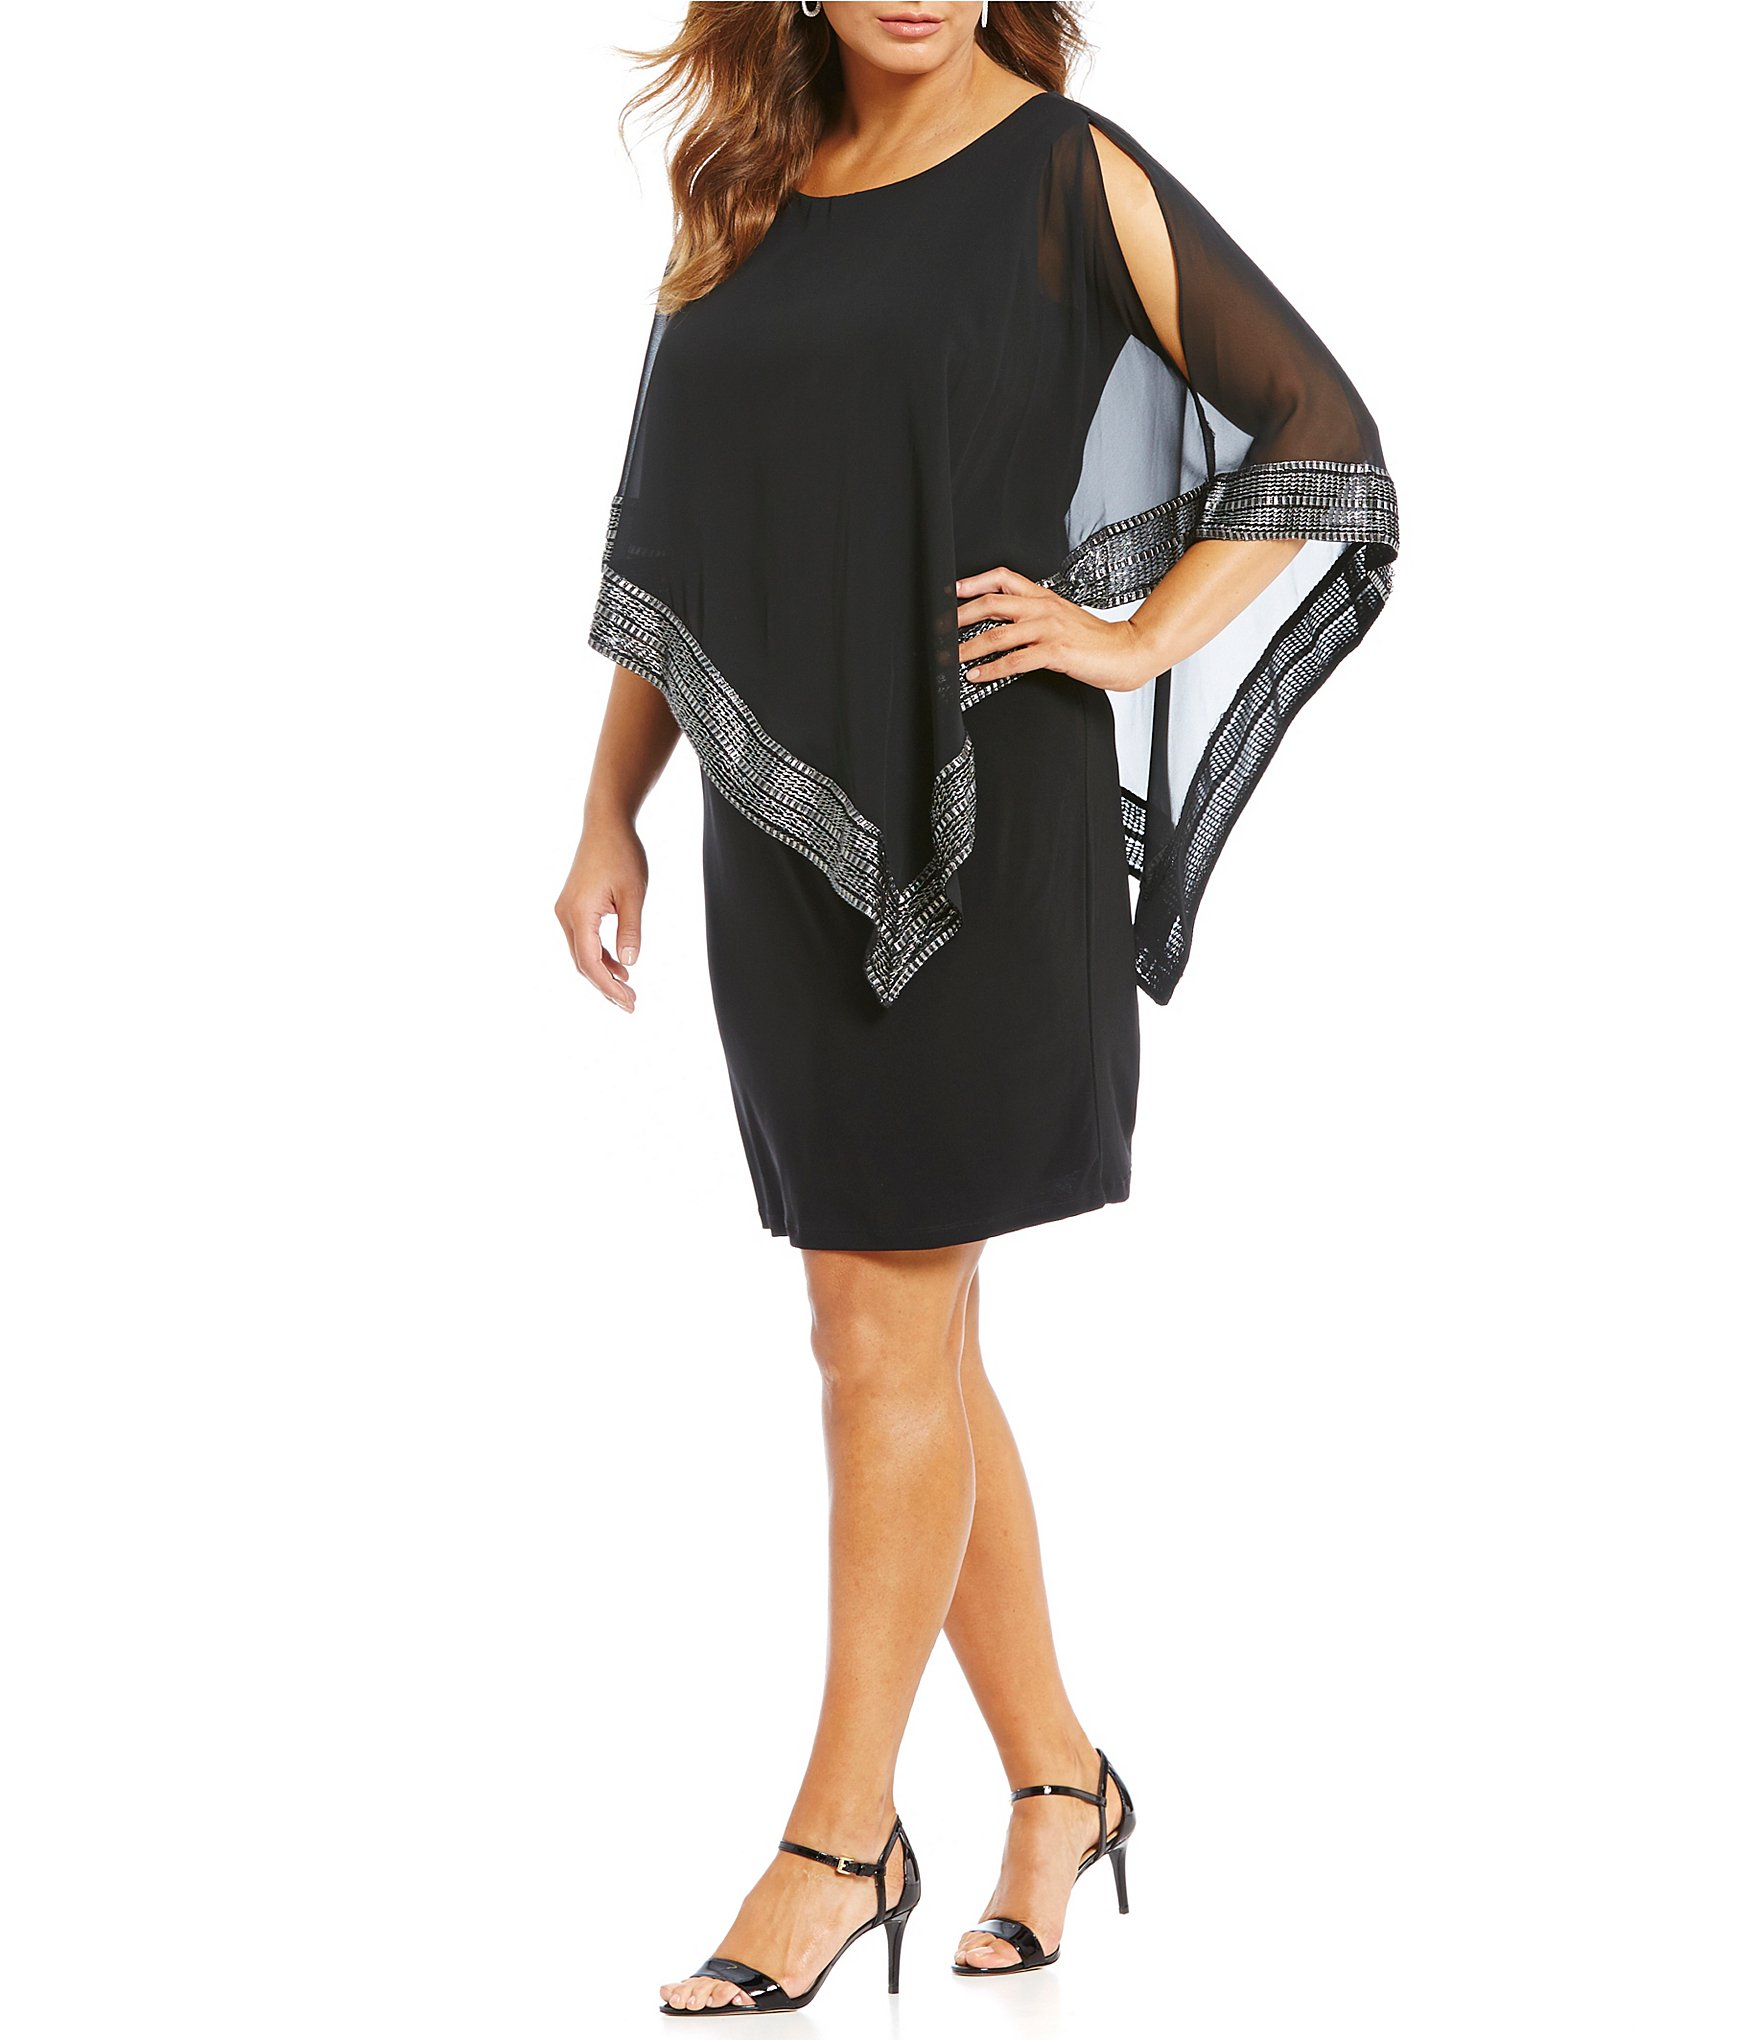 Plus-Size Short-Sleeve Cocktail Dresses | Dillards